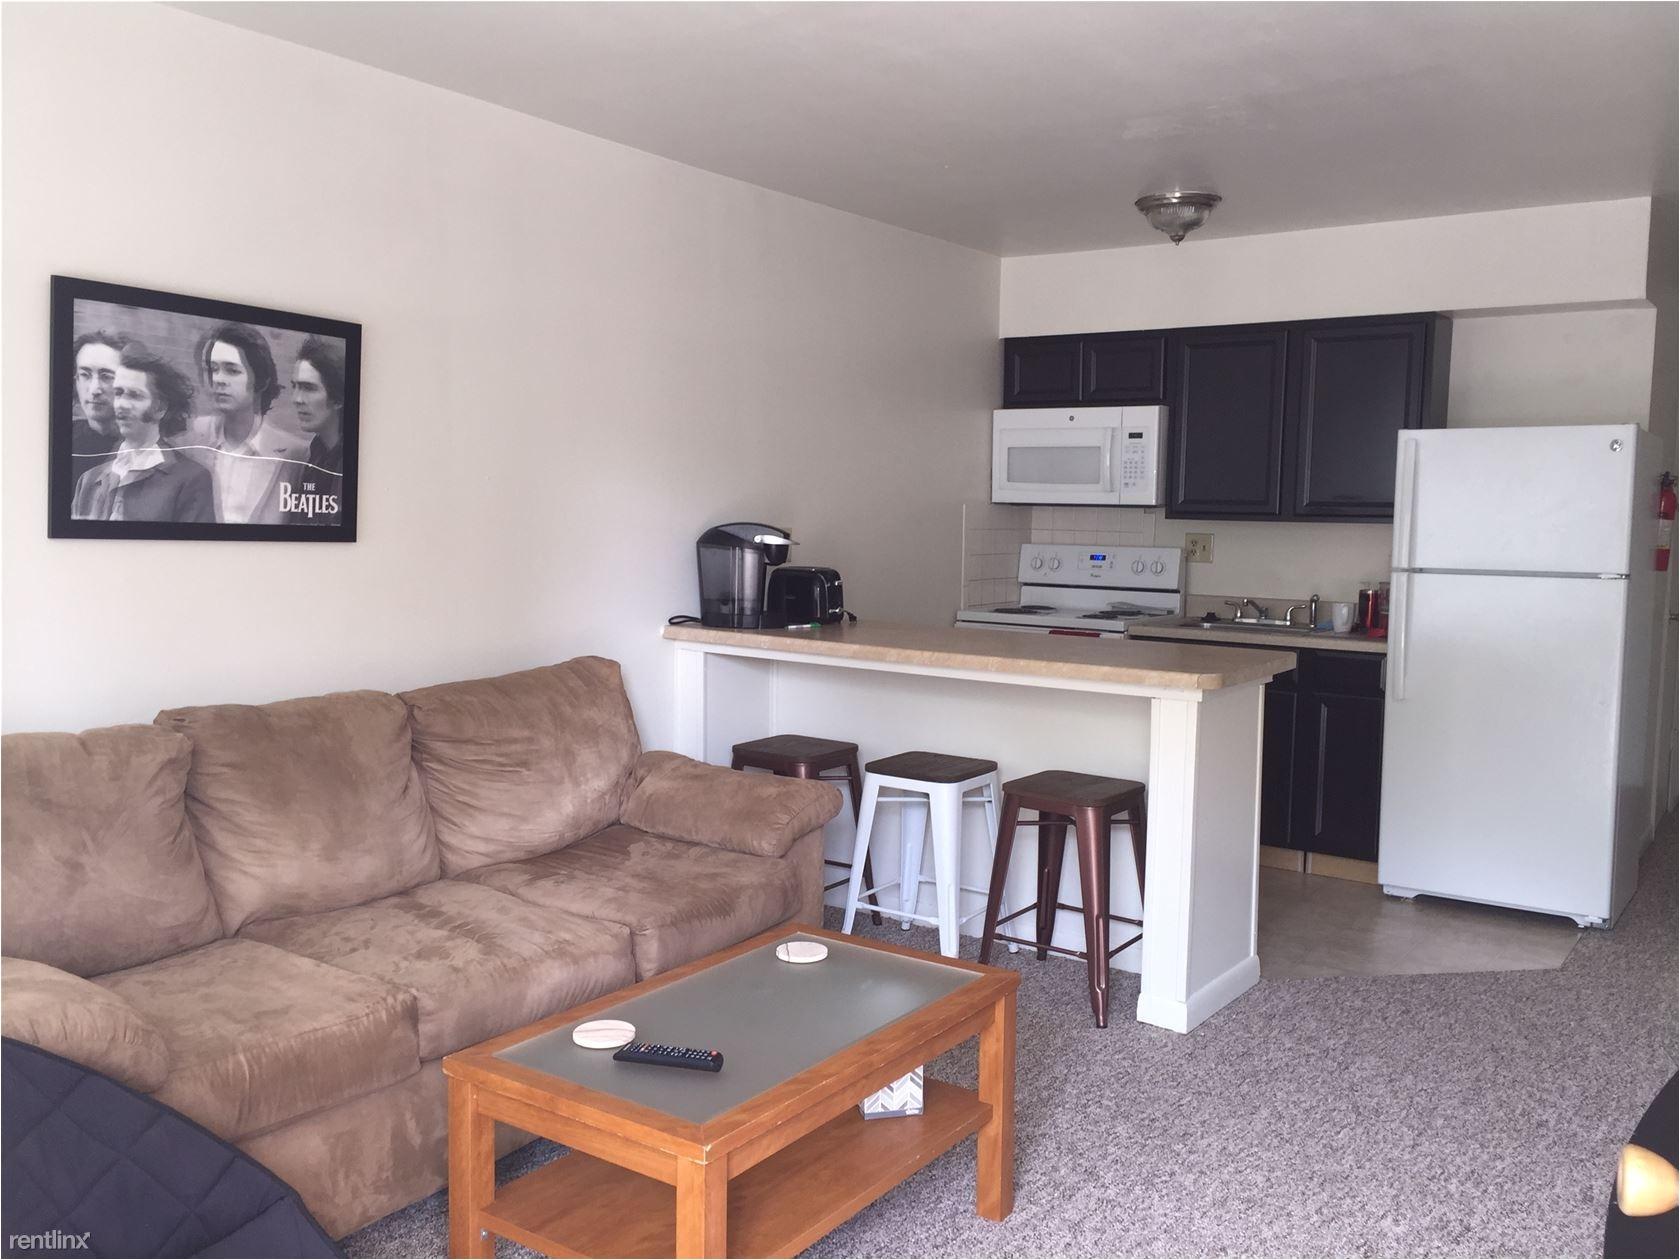 Cheap 1 Bedroom Apartments Bloomington Indiana Mulligan Place Apartments 205 E 20th St Bloomington In 47408